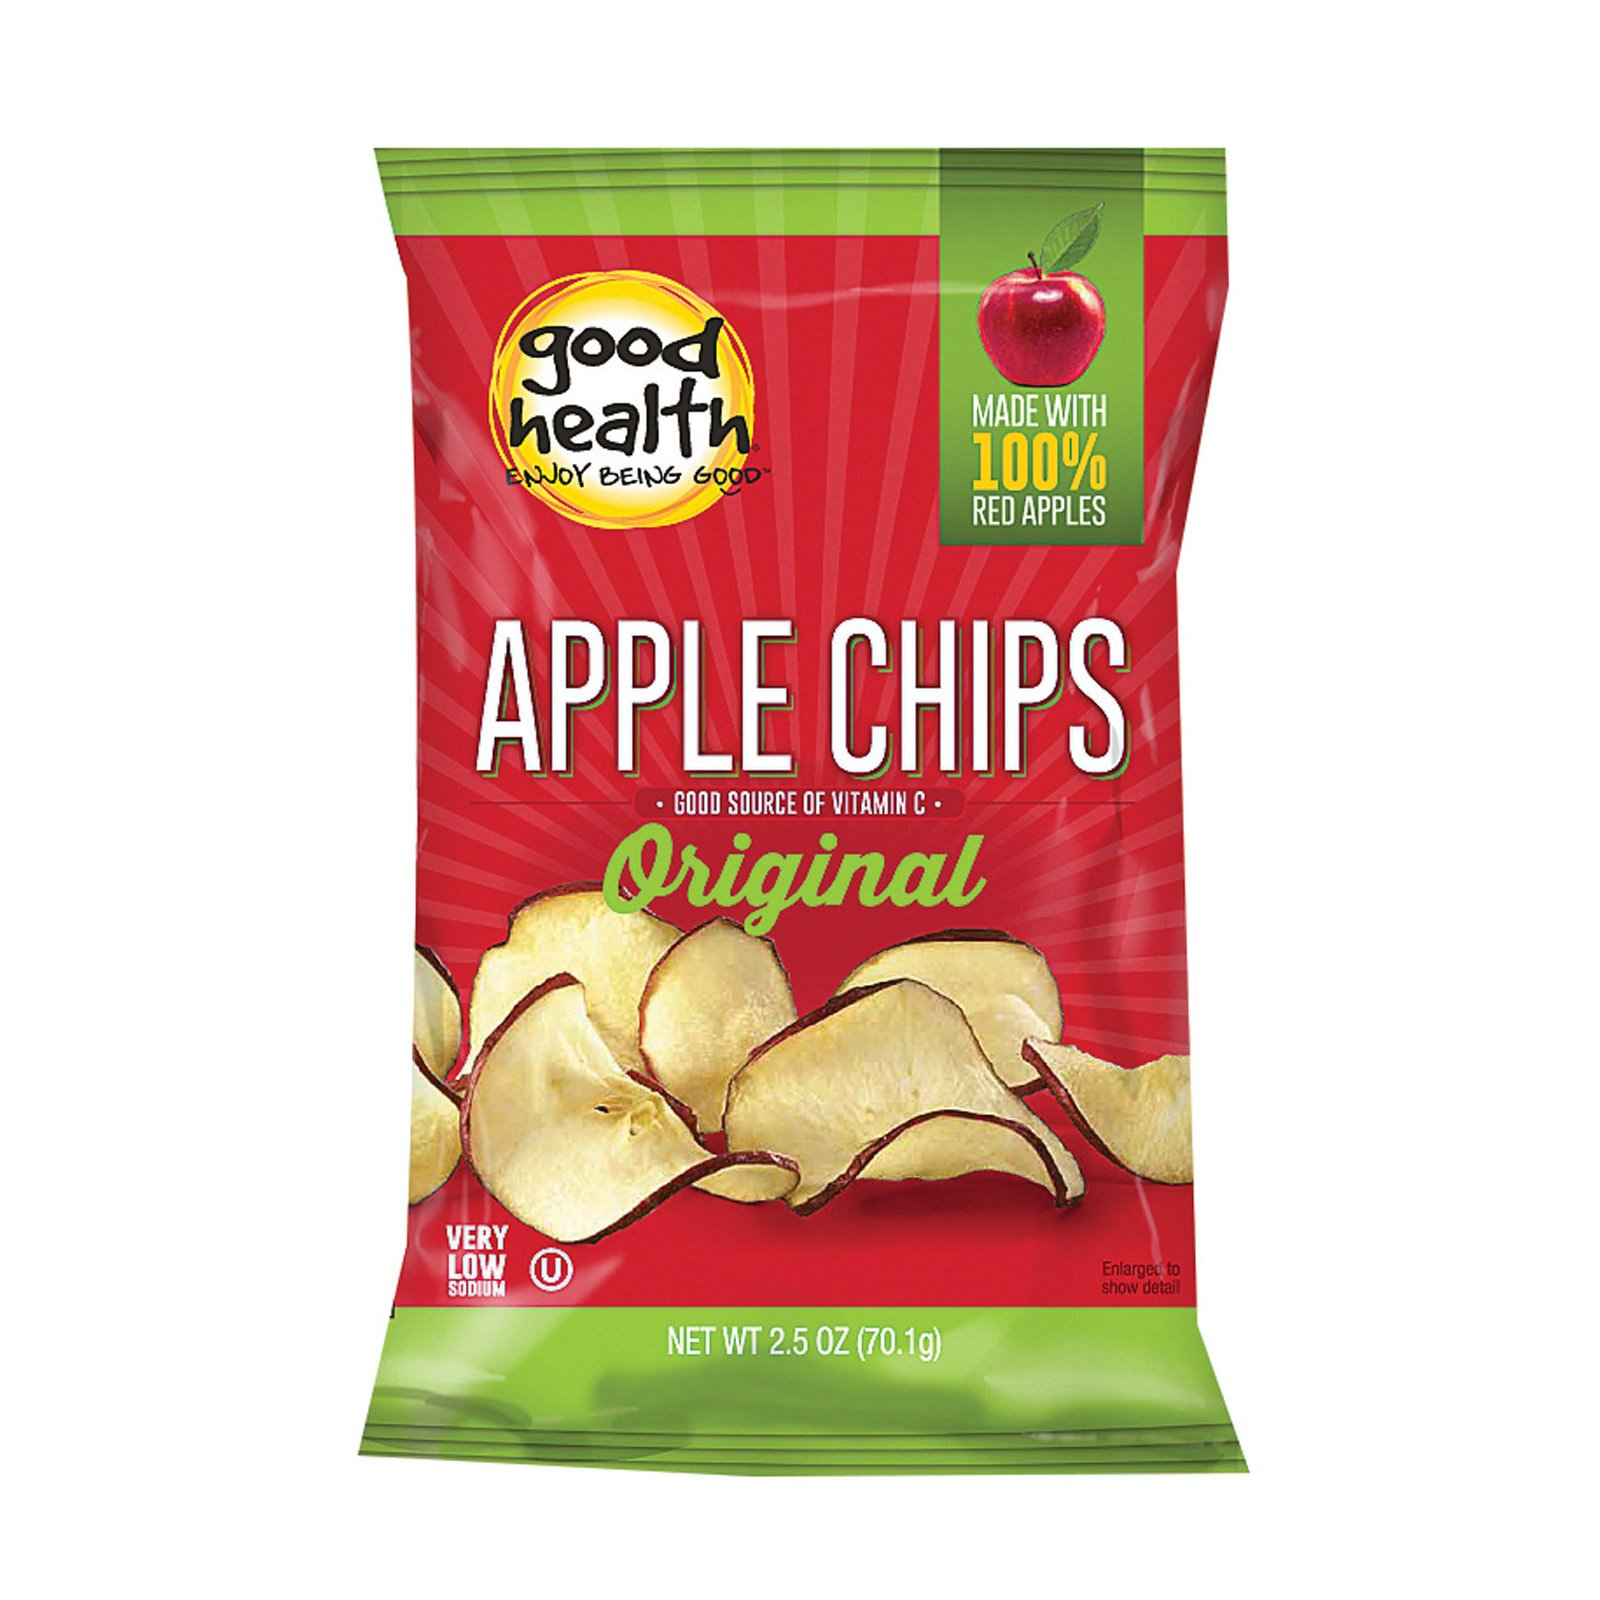 Good Health Apple Chips - Crispy Original - Case of 12-2.5 oz.